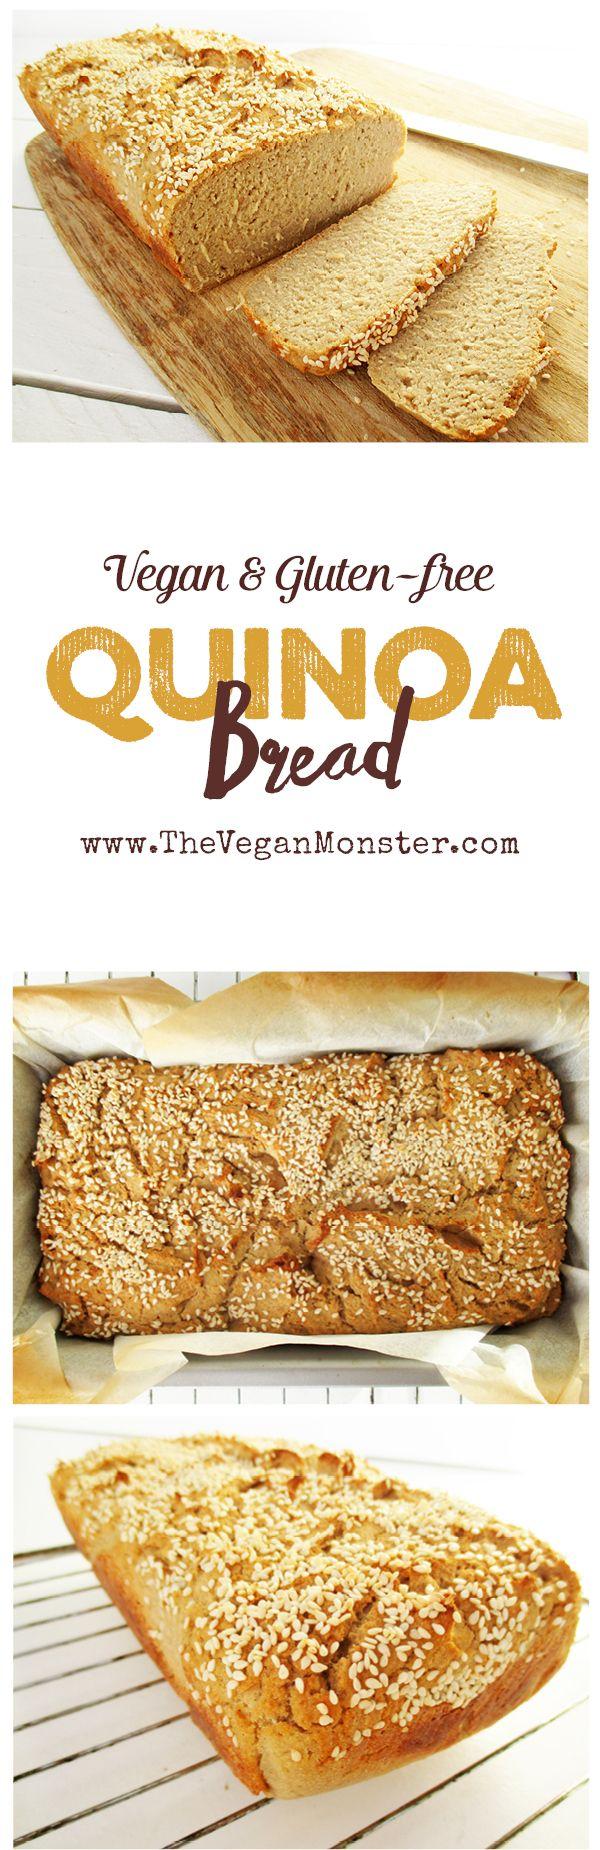 Quinoa Bread. Vegan, gluten-free, oil-free. (Fitness Food Gluten Free)